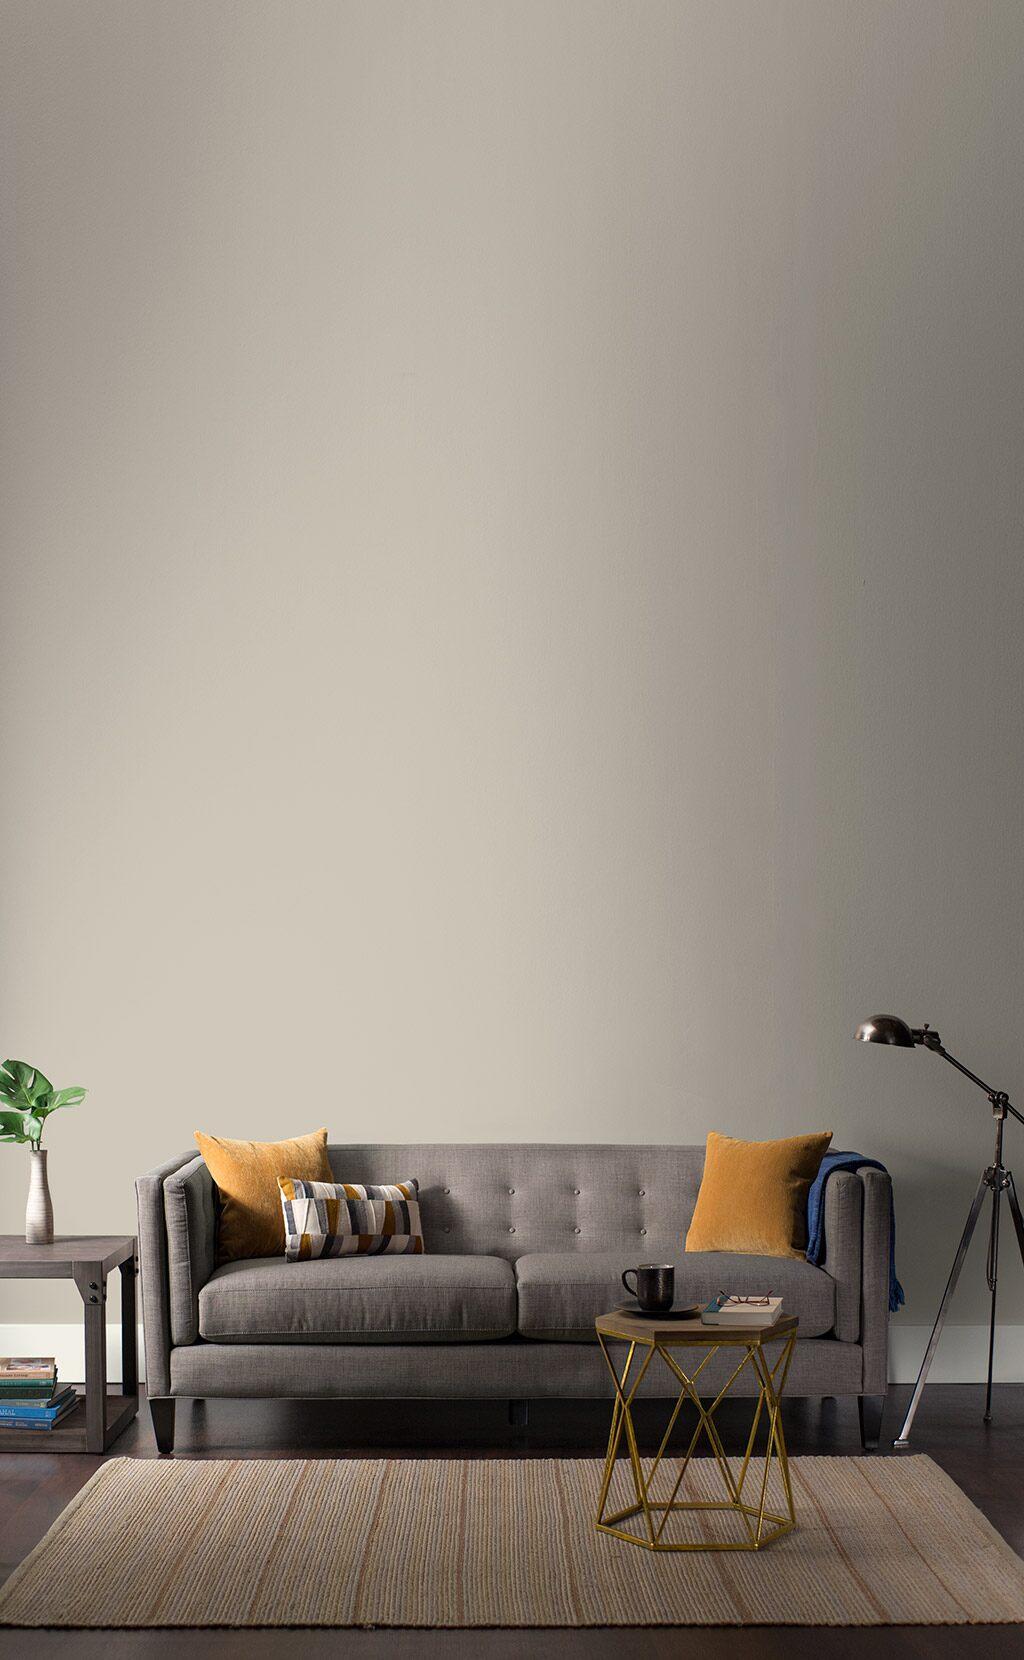 Lovely Benjamin Moore Paints & Stains | Benjamin Moore YL11